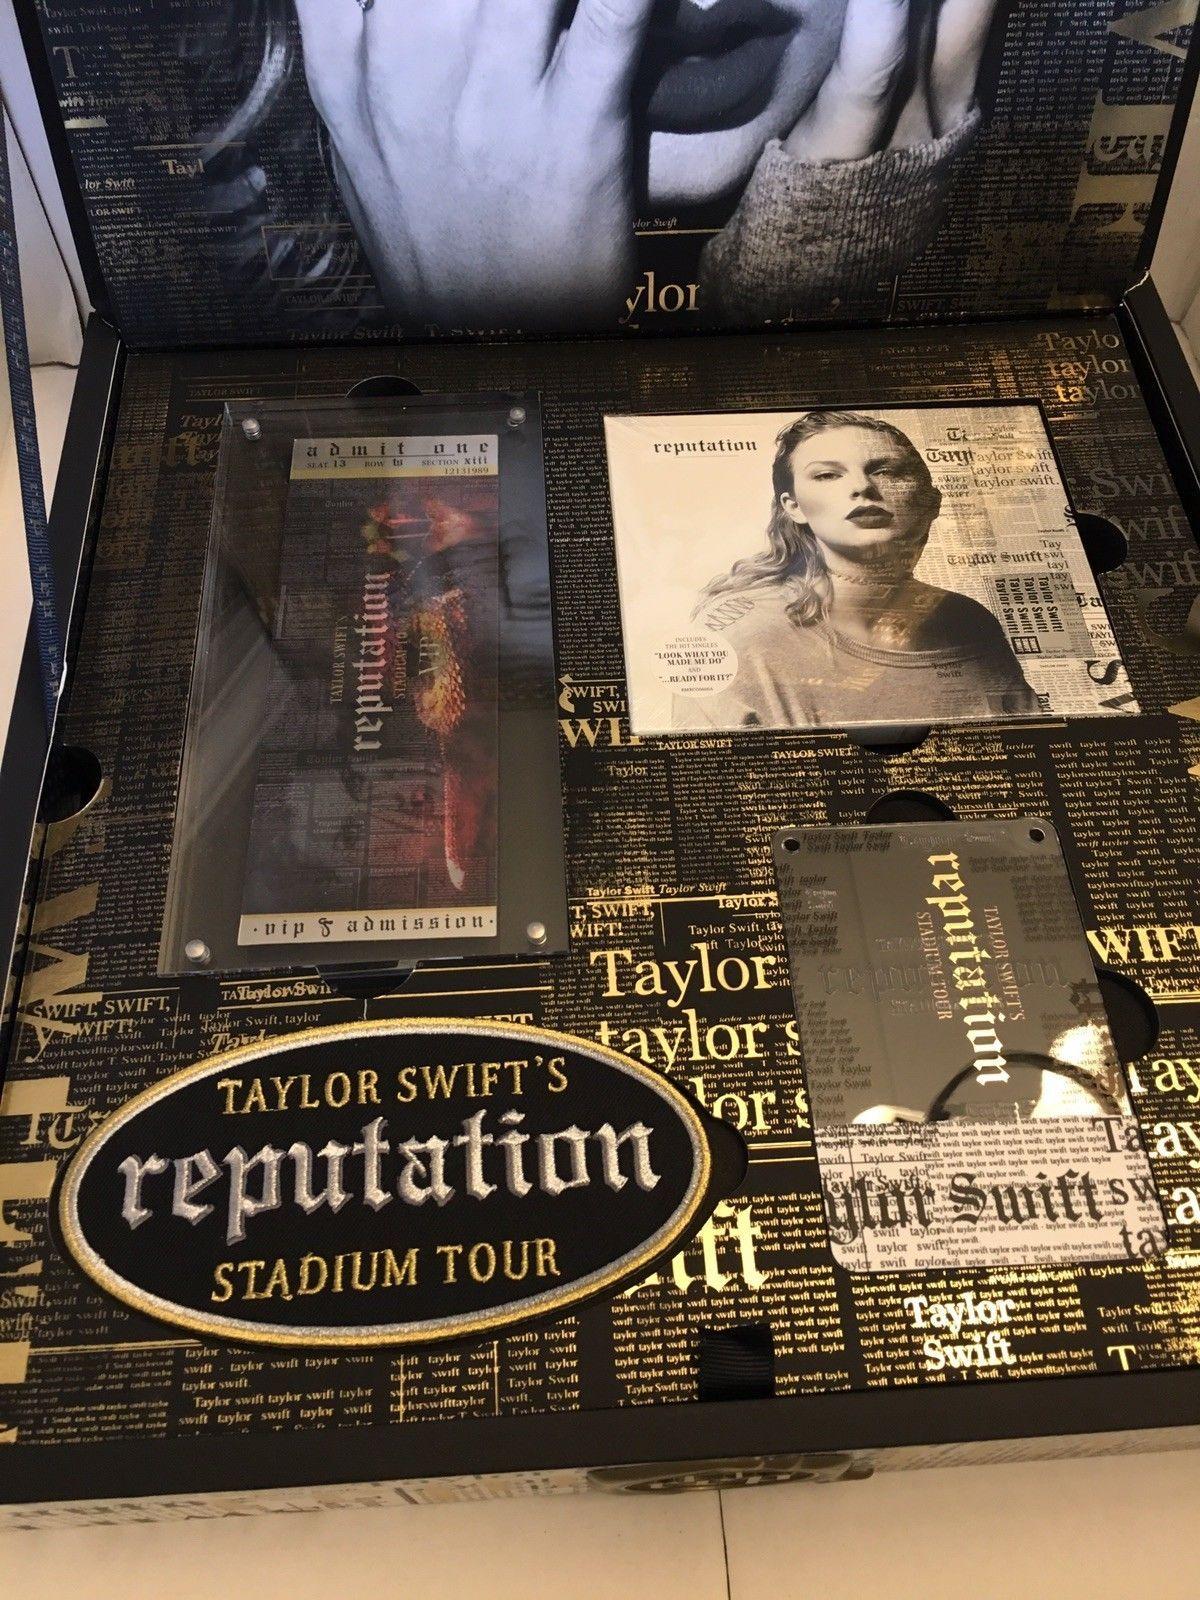 Taylor Swift Gift Box Reputation Tour Vip Collectors Commemorative Box Taylor Swift Merchandise Taylor Swift Concert Taylor Swift